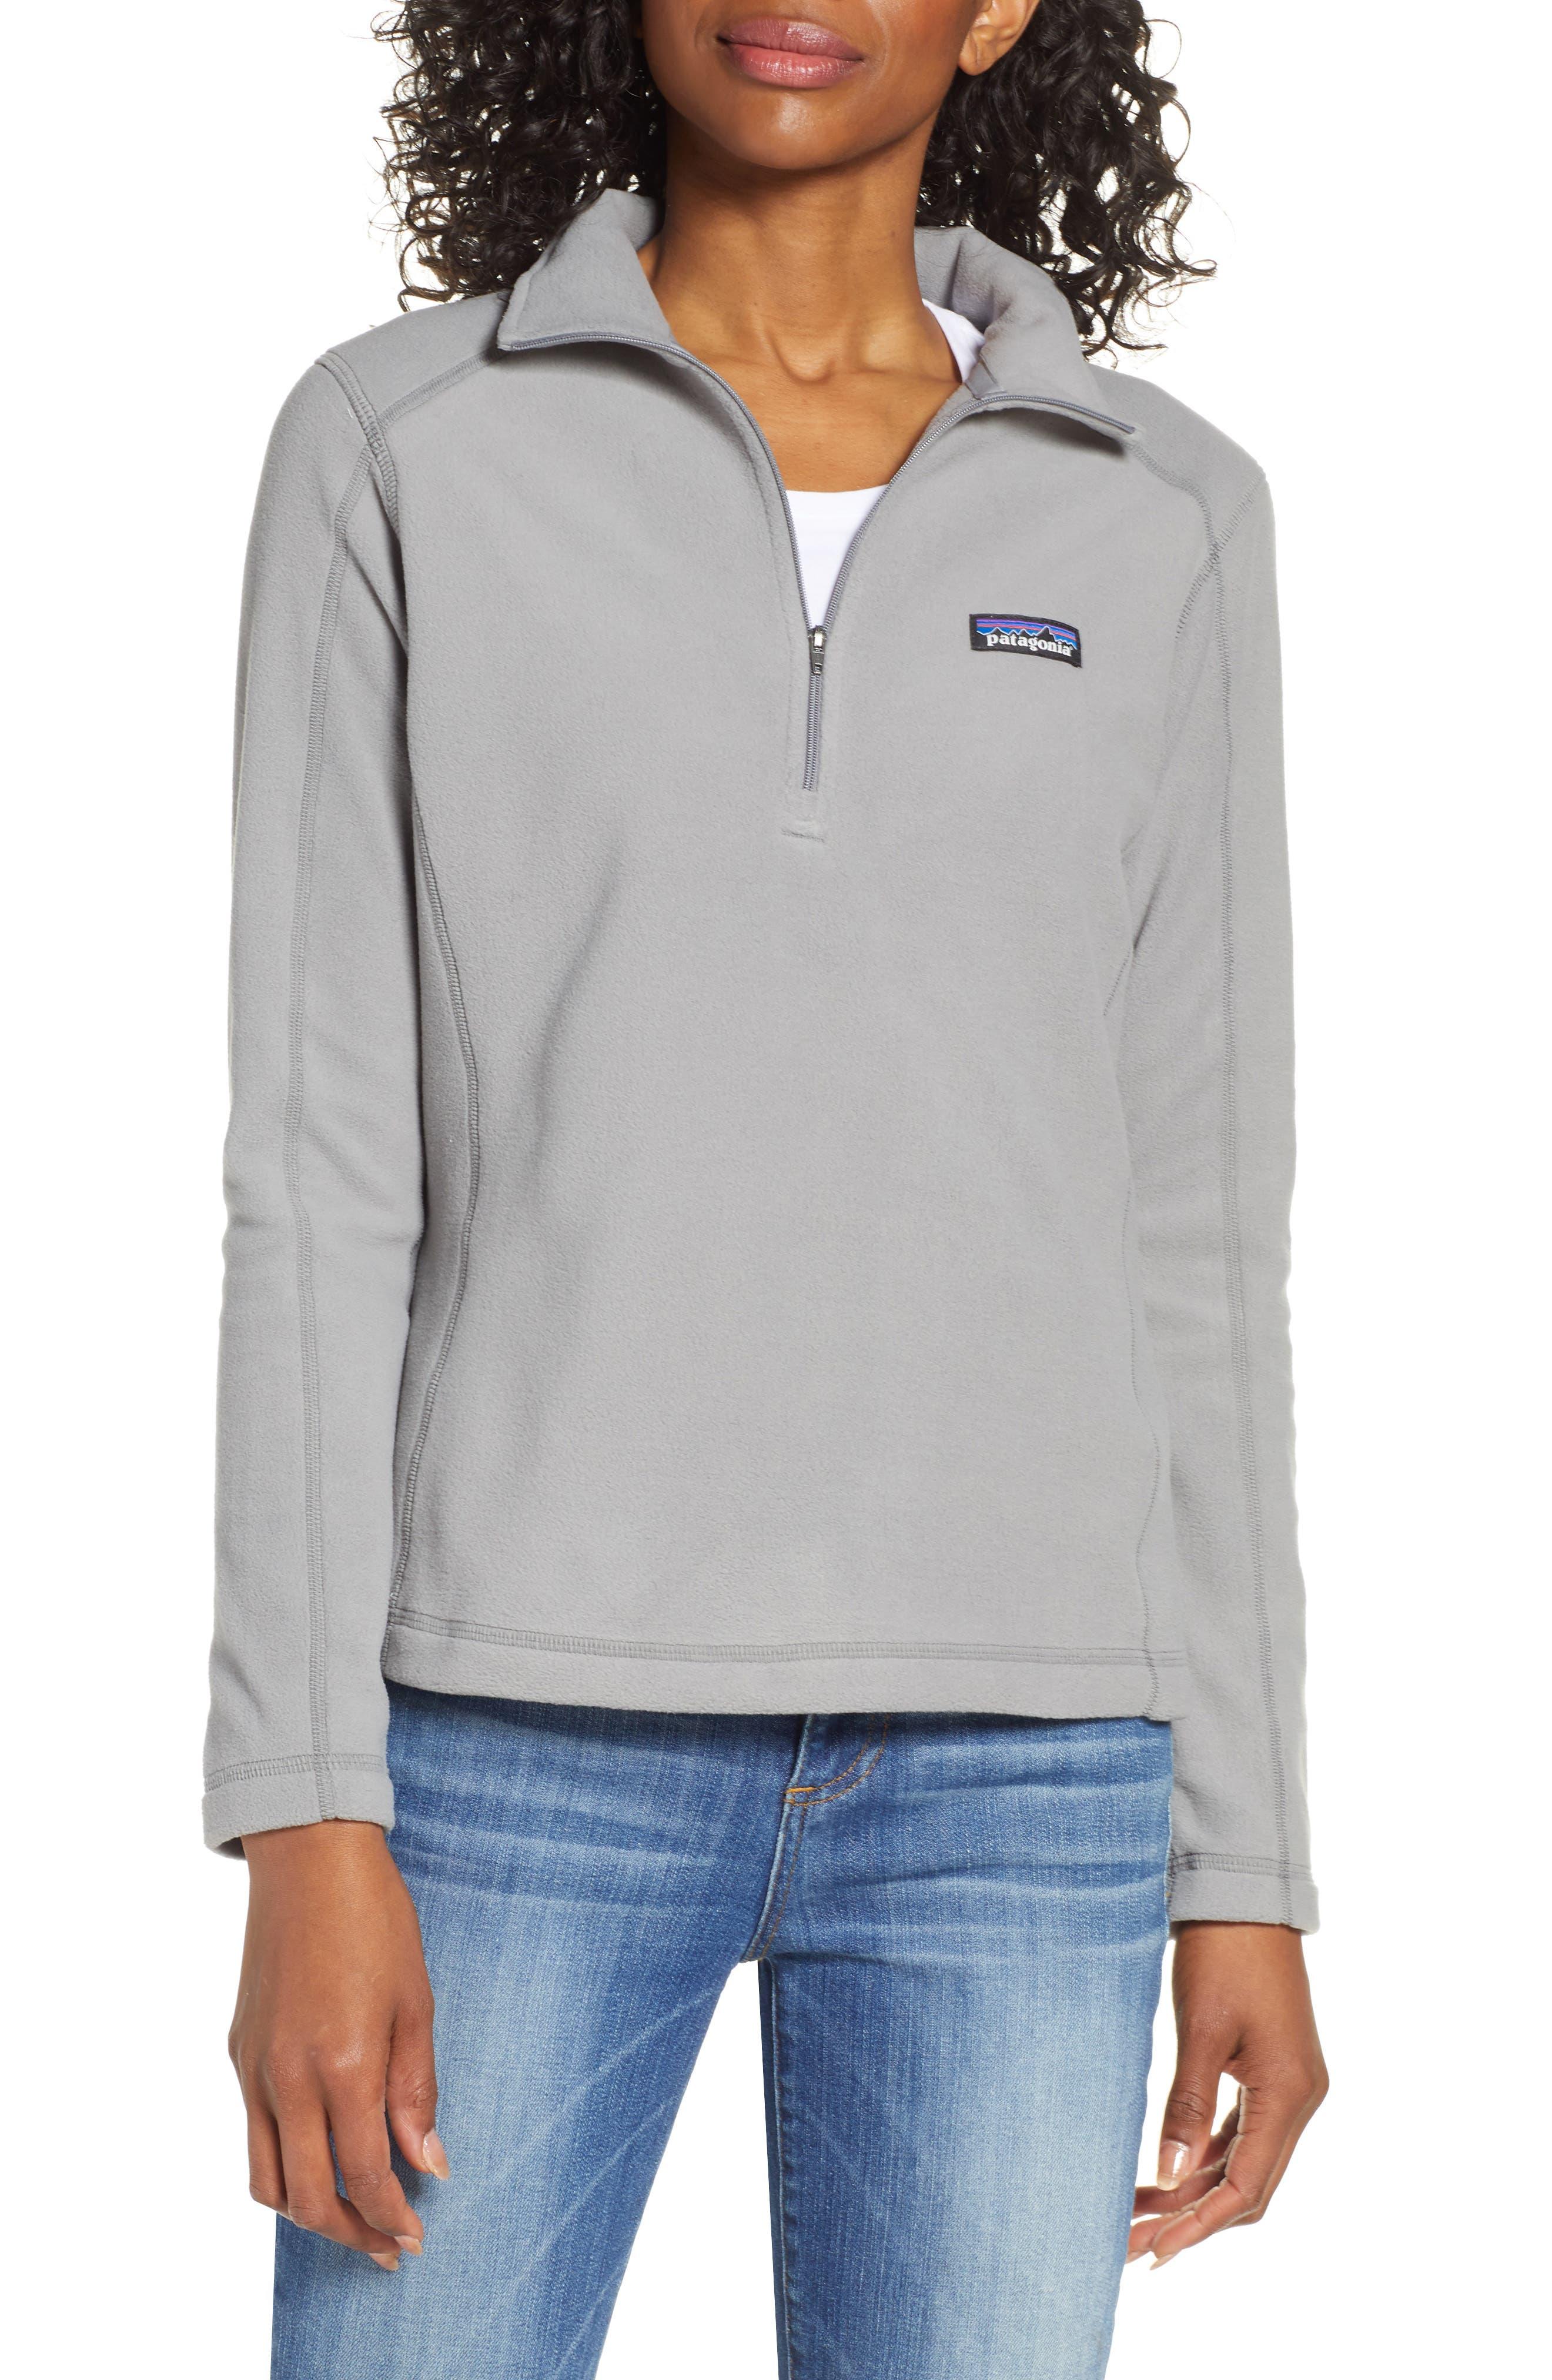 NEWMEEN Womens 1//4 Zip Lightweight Polar Fleece Pullover Sweatshirt with Pockets